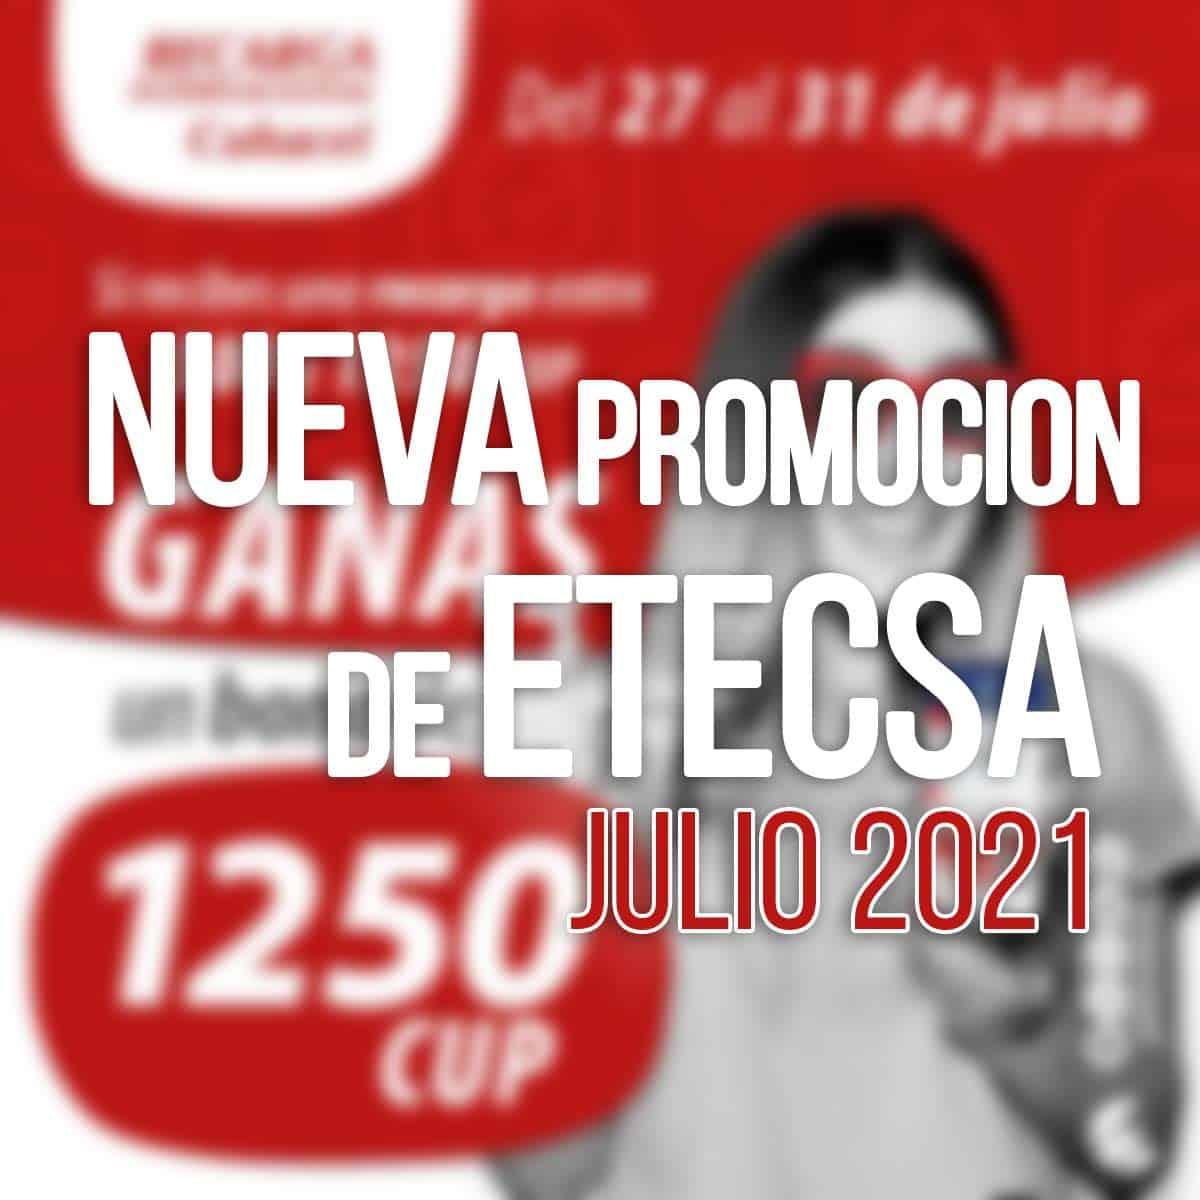 promocion recarga del exterior etecsa julio 2021